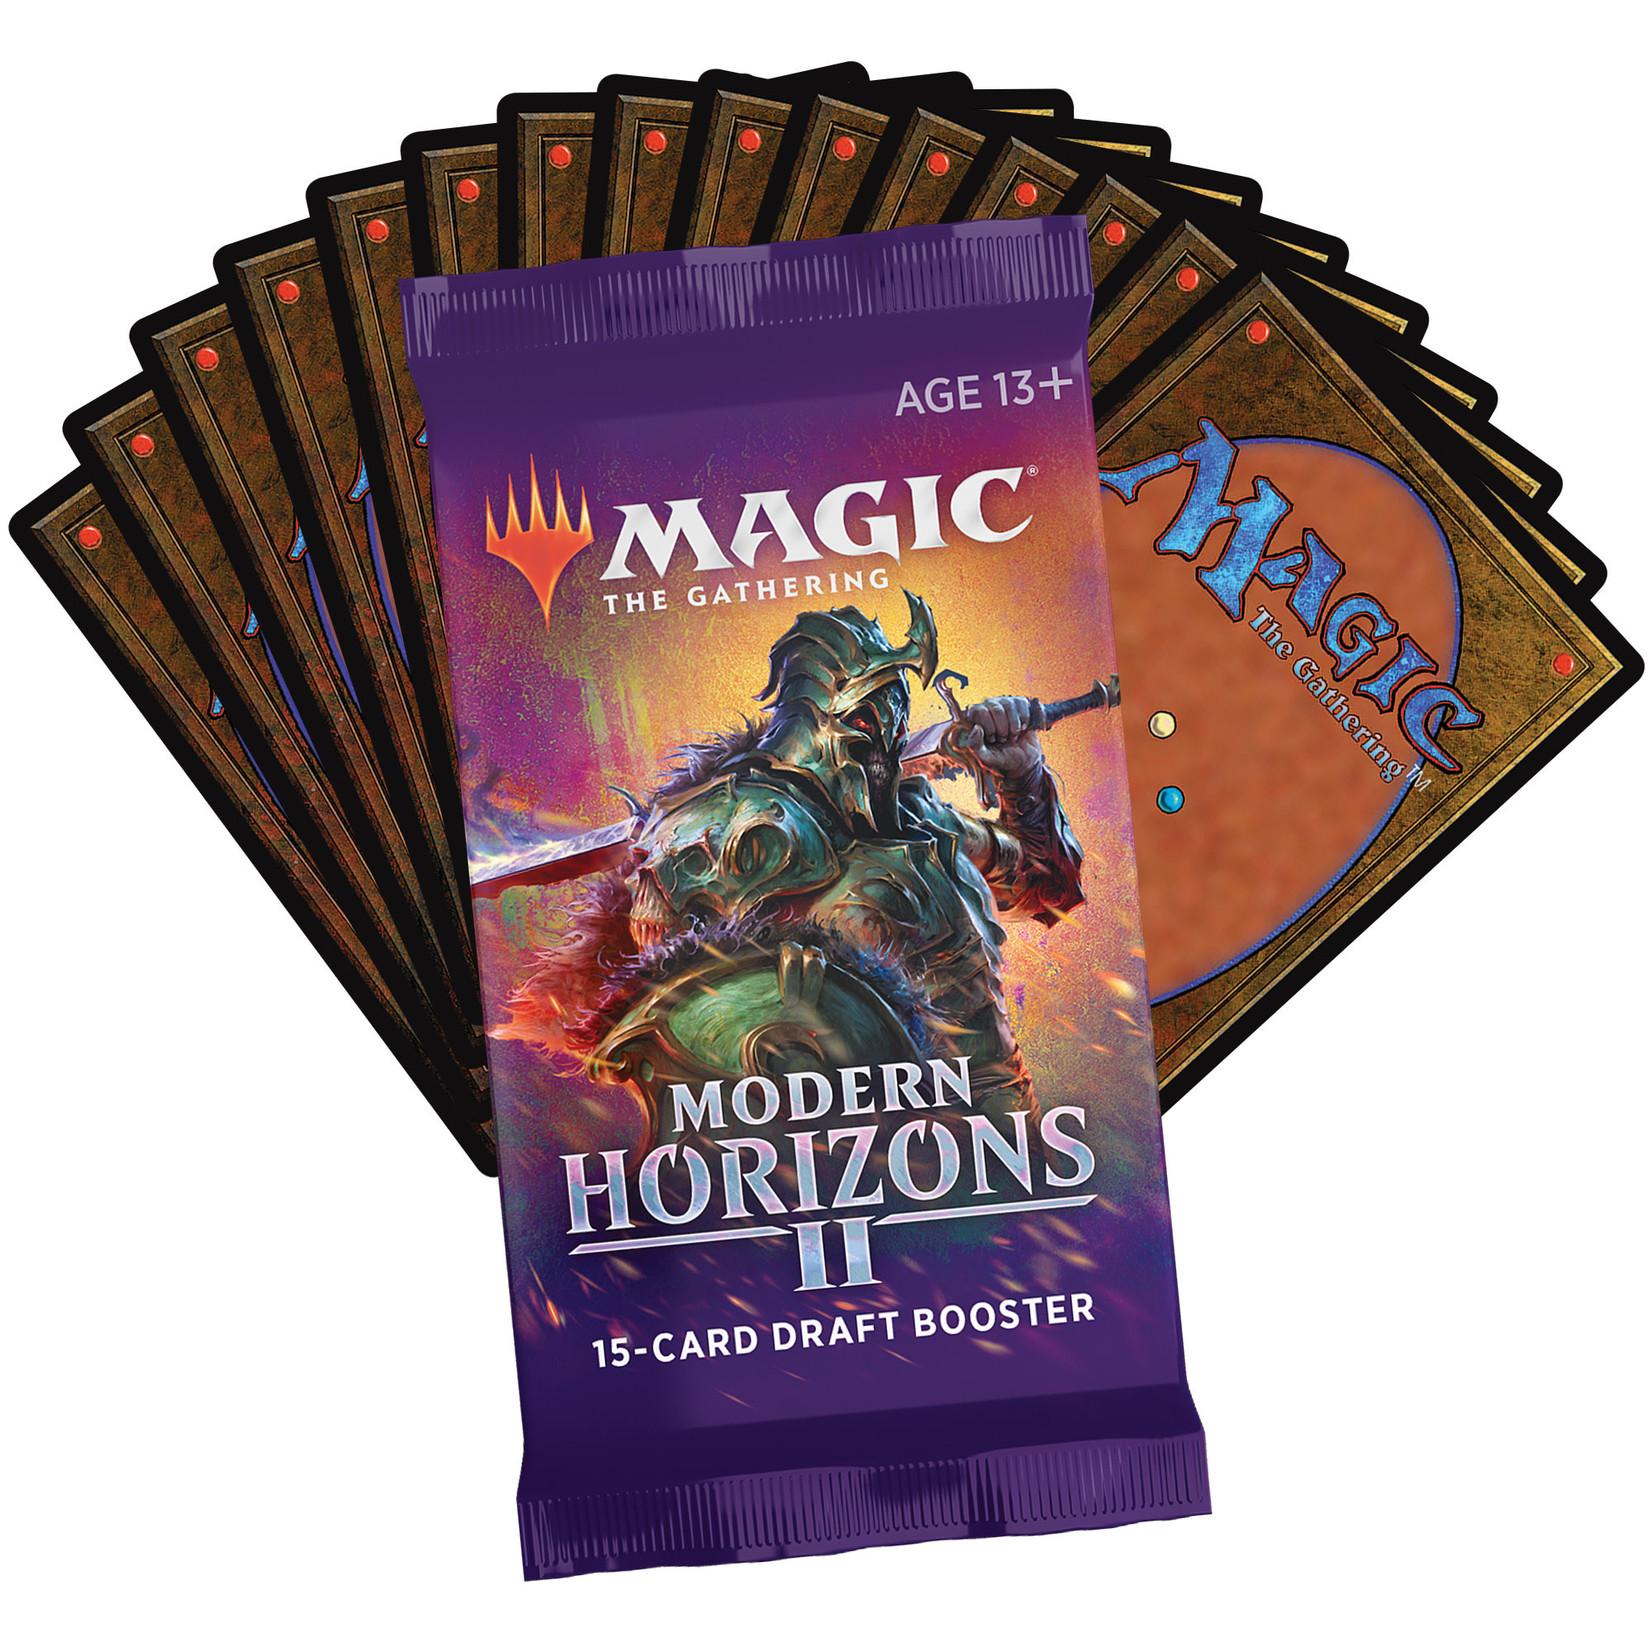 Magic: The Gathering Magic: The Gathering - Modern Horizons 2 - Draft Booster Box